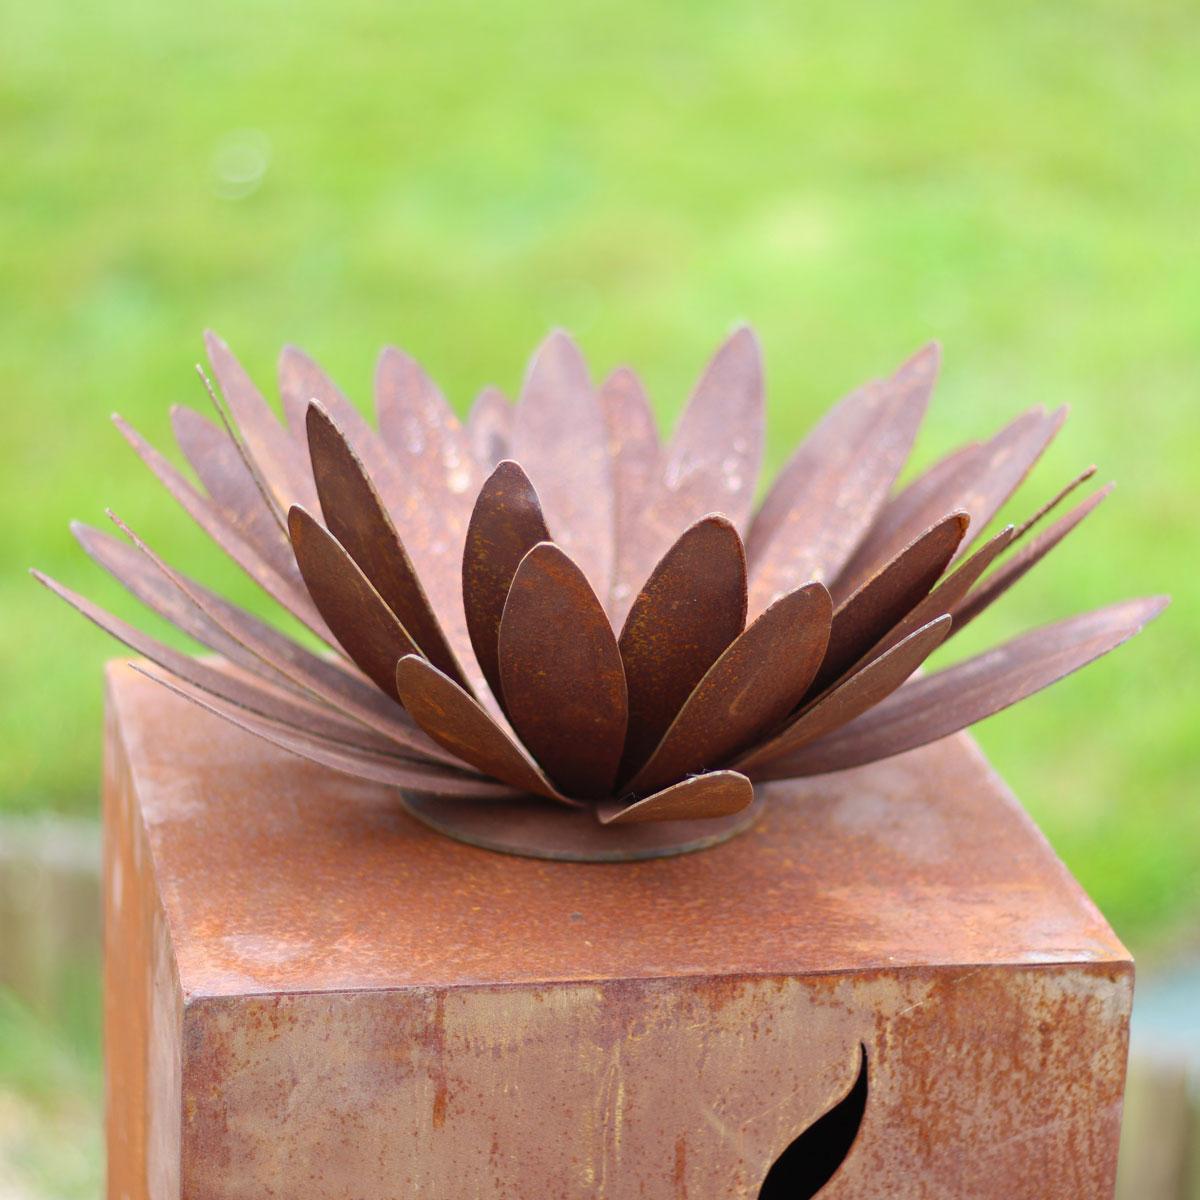 fleur de chrysanth me en m tal rouill objets d co de jardin en m tal. Black Bedroom Furniture Sets. Home Design Ideas